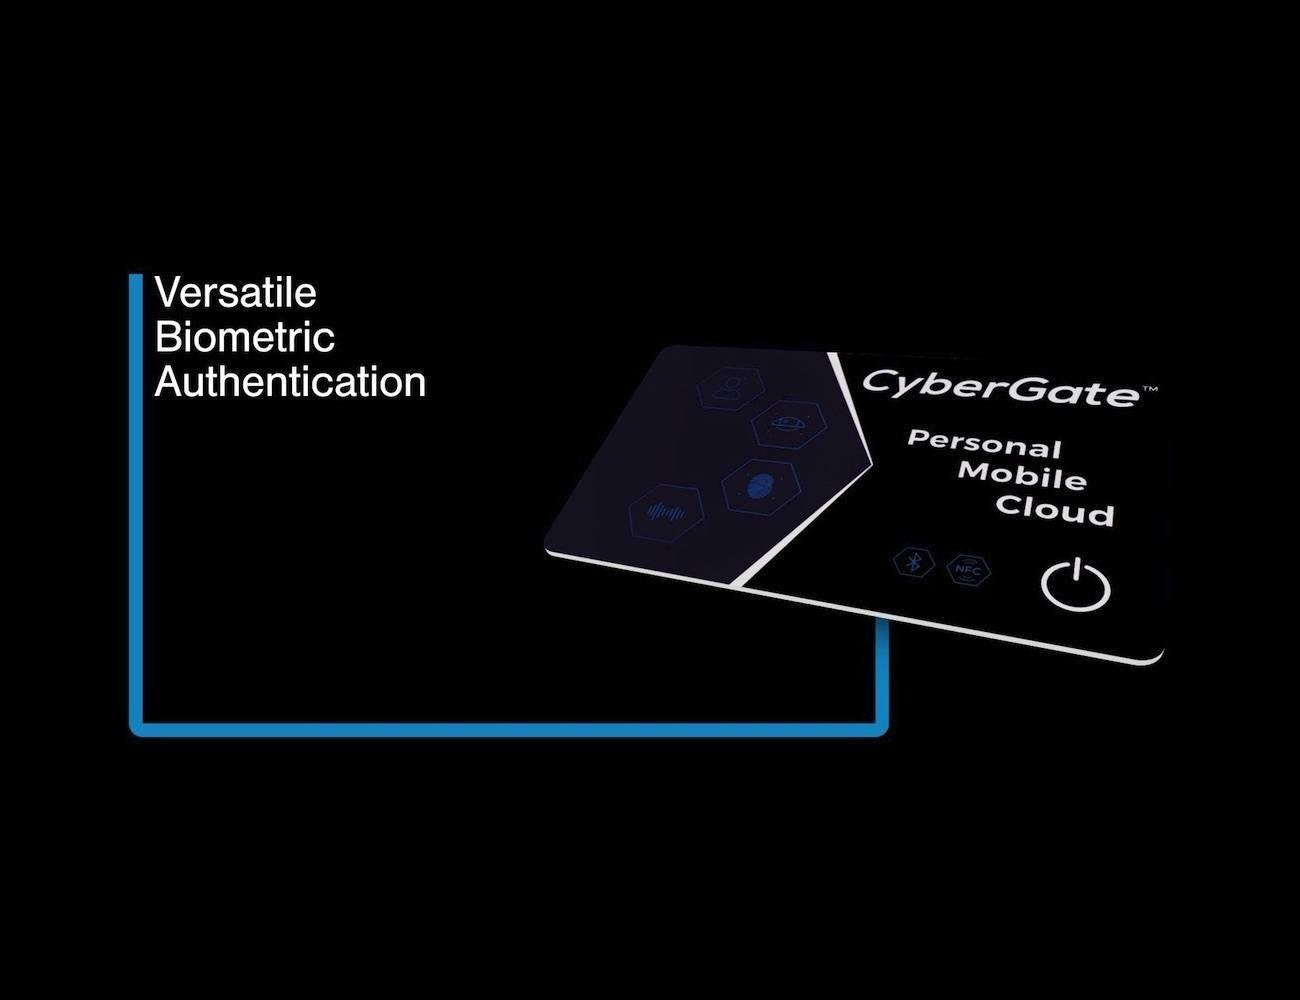 CyberGate Personal Mobile Cloud